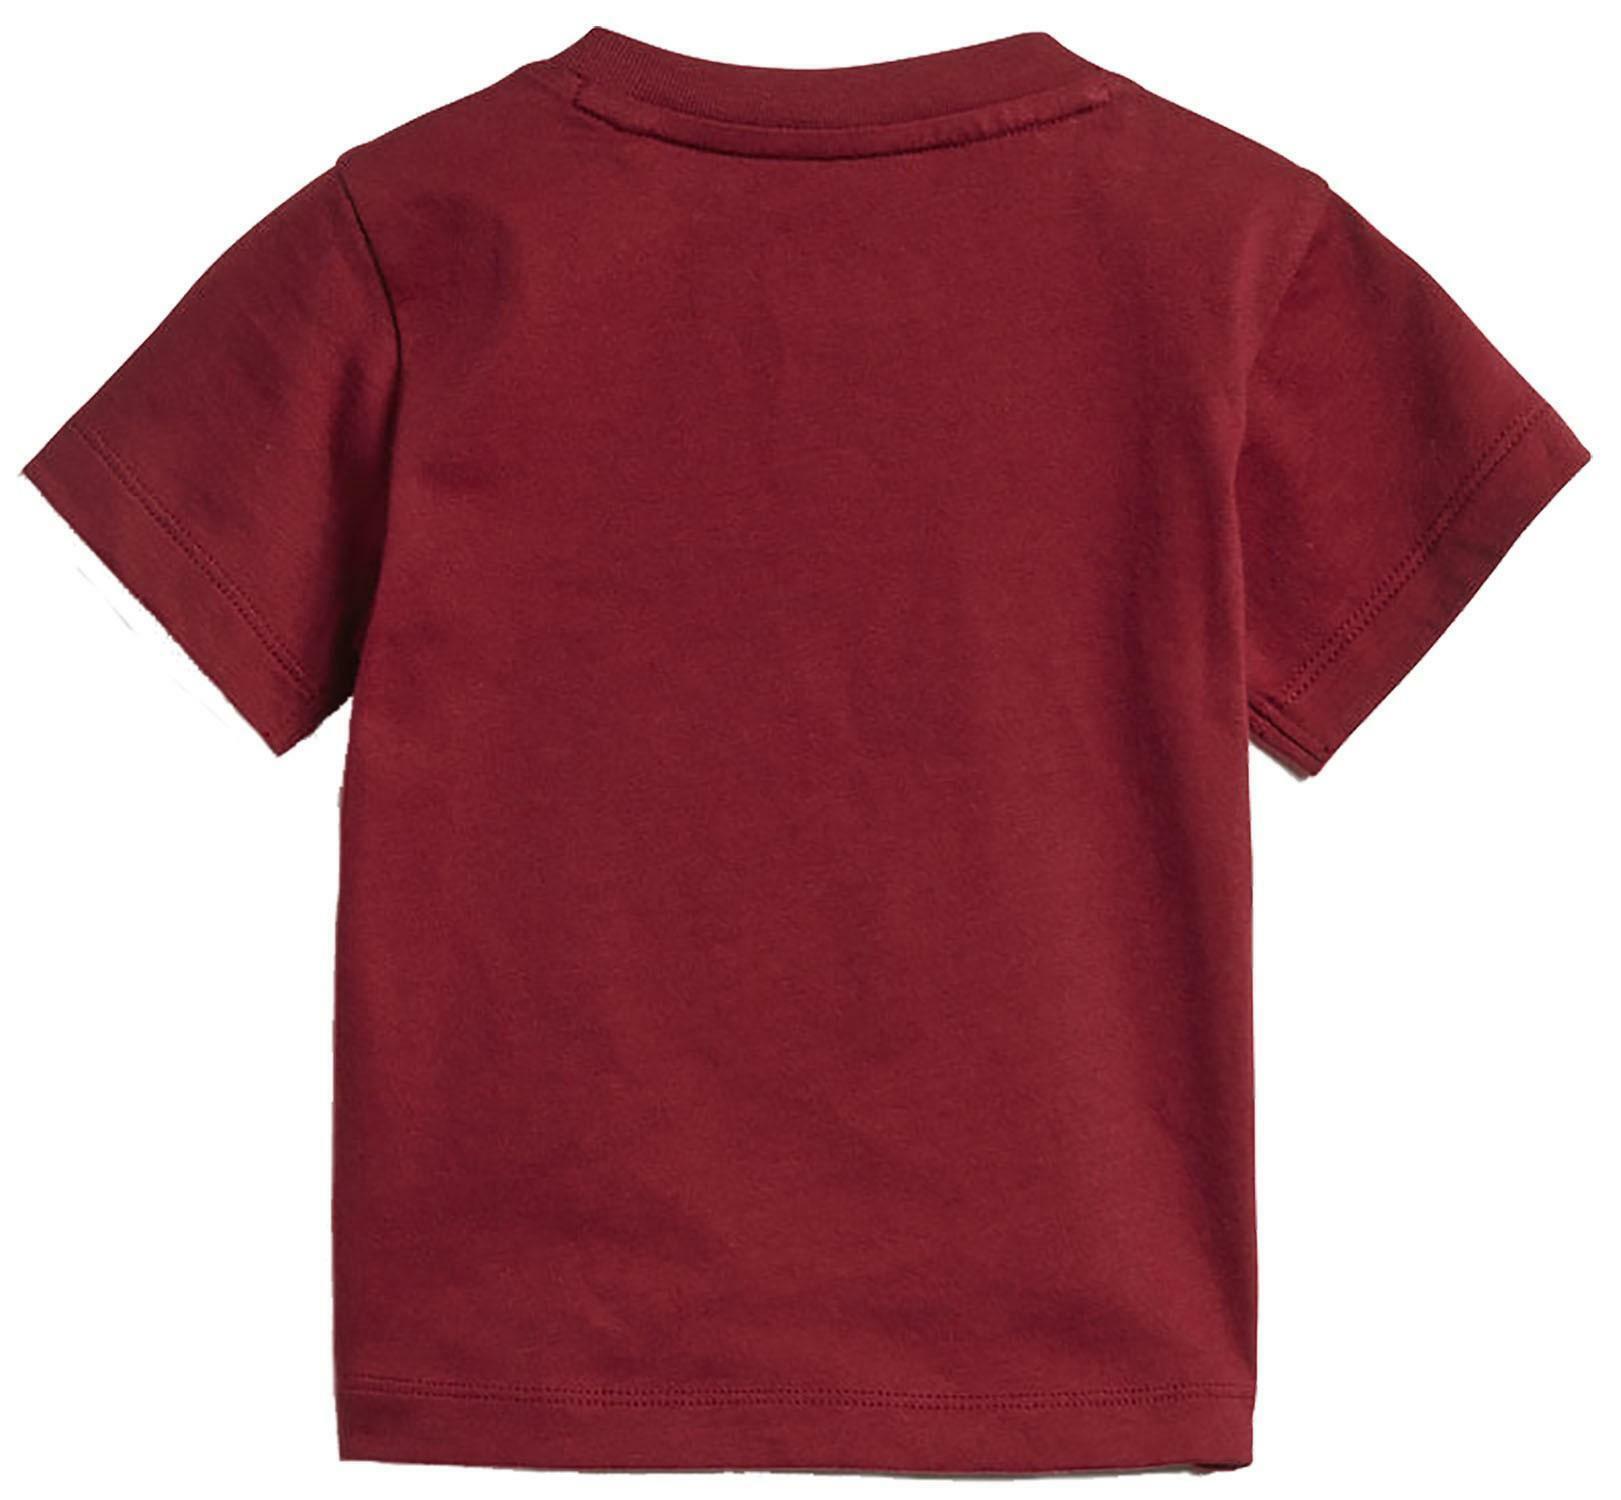 adidas adidas i trf tee t-shirt bambino/a bordeaux d96100